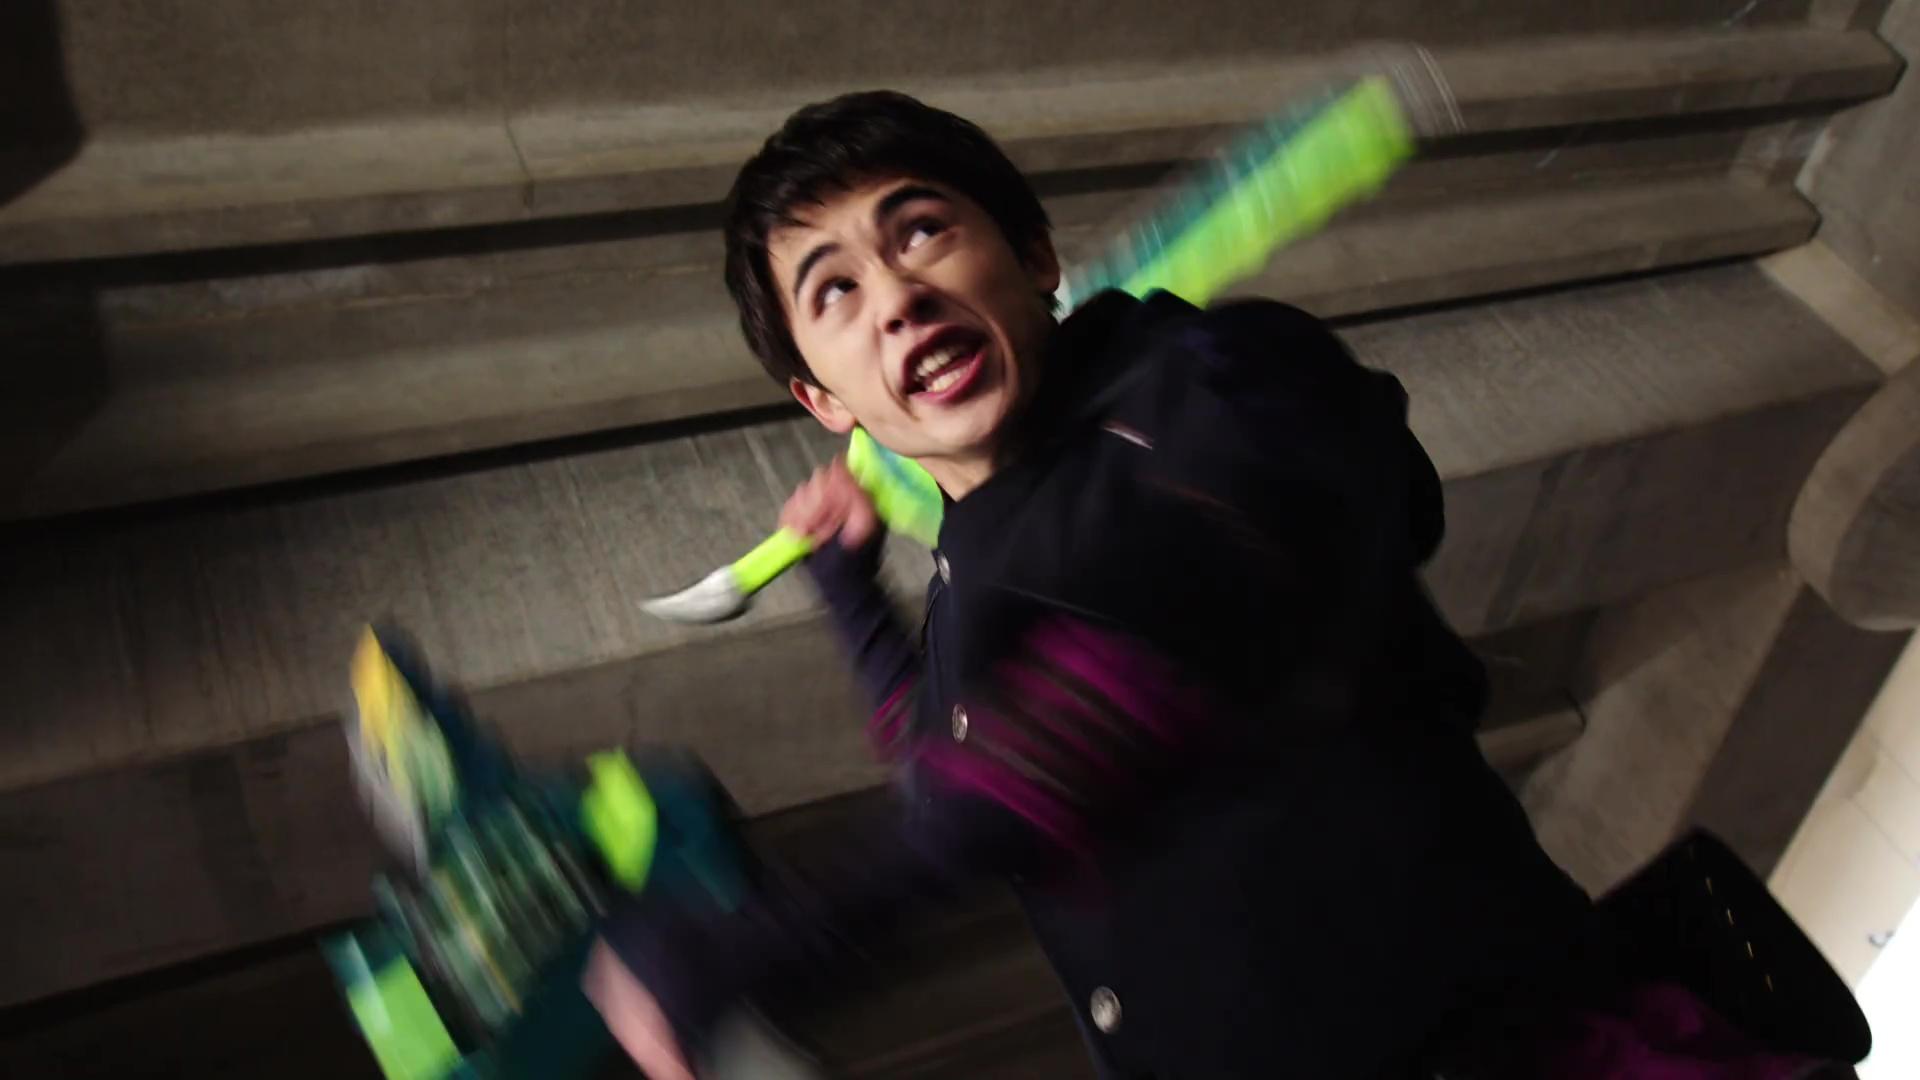 Kamen Rider Saber Episode 16 Recap